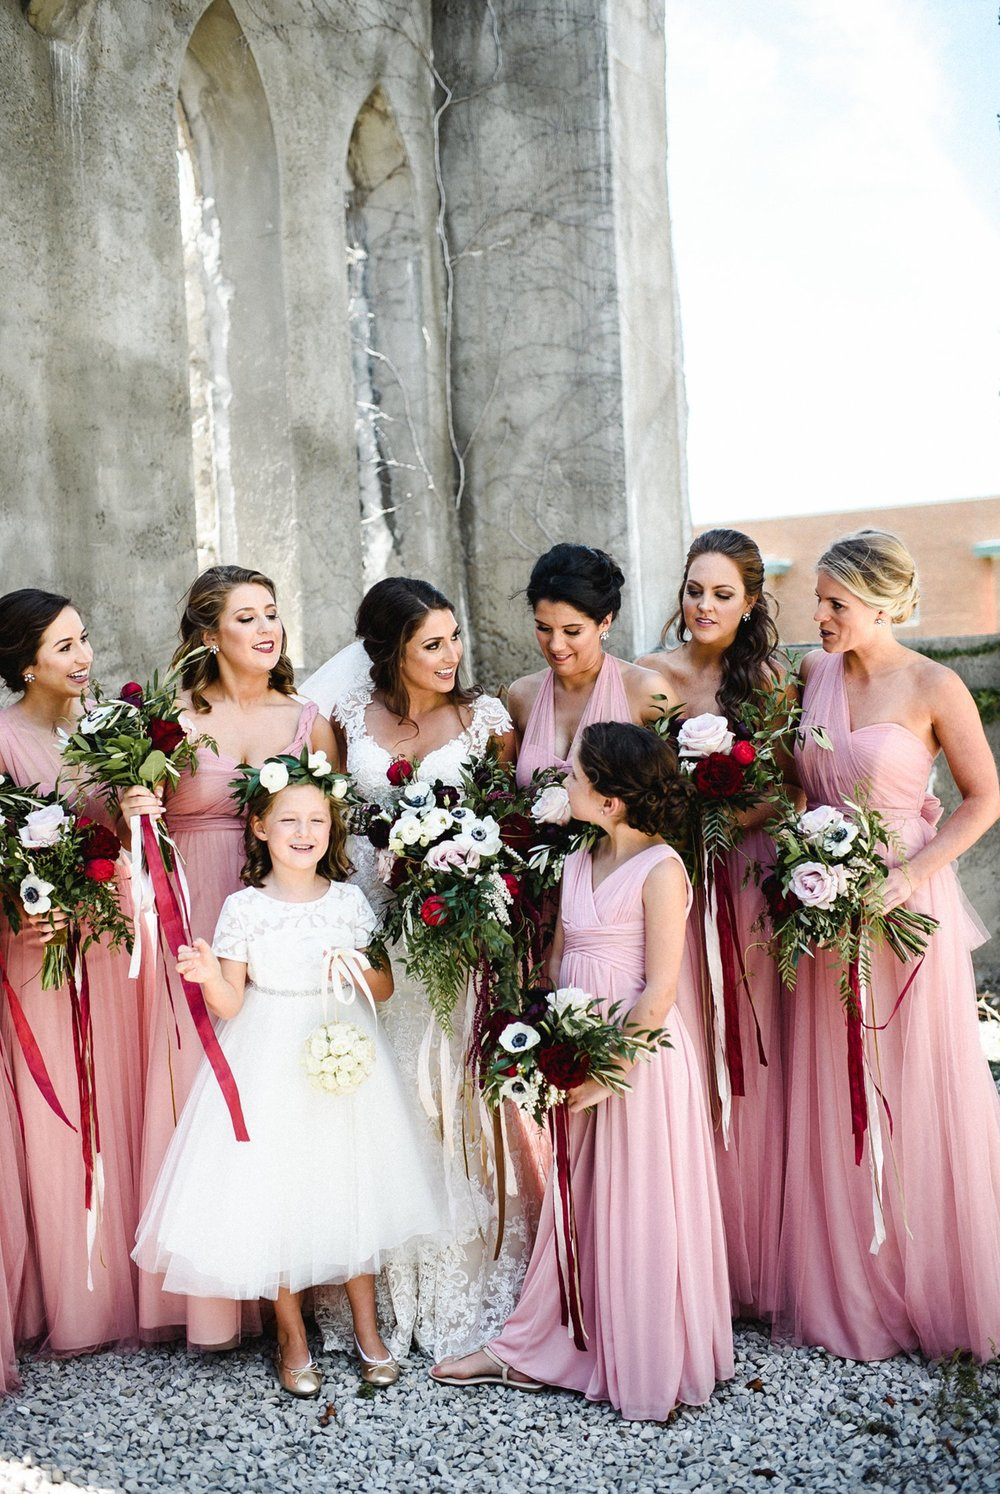 Hagan_wedding 50.jpg